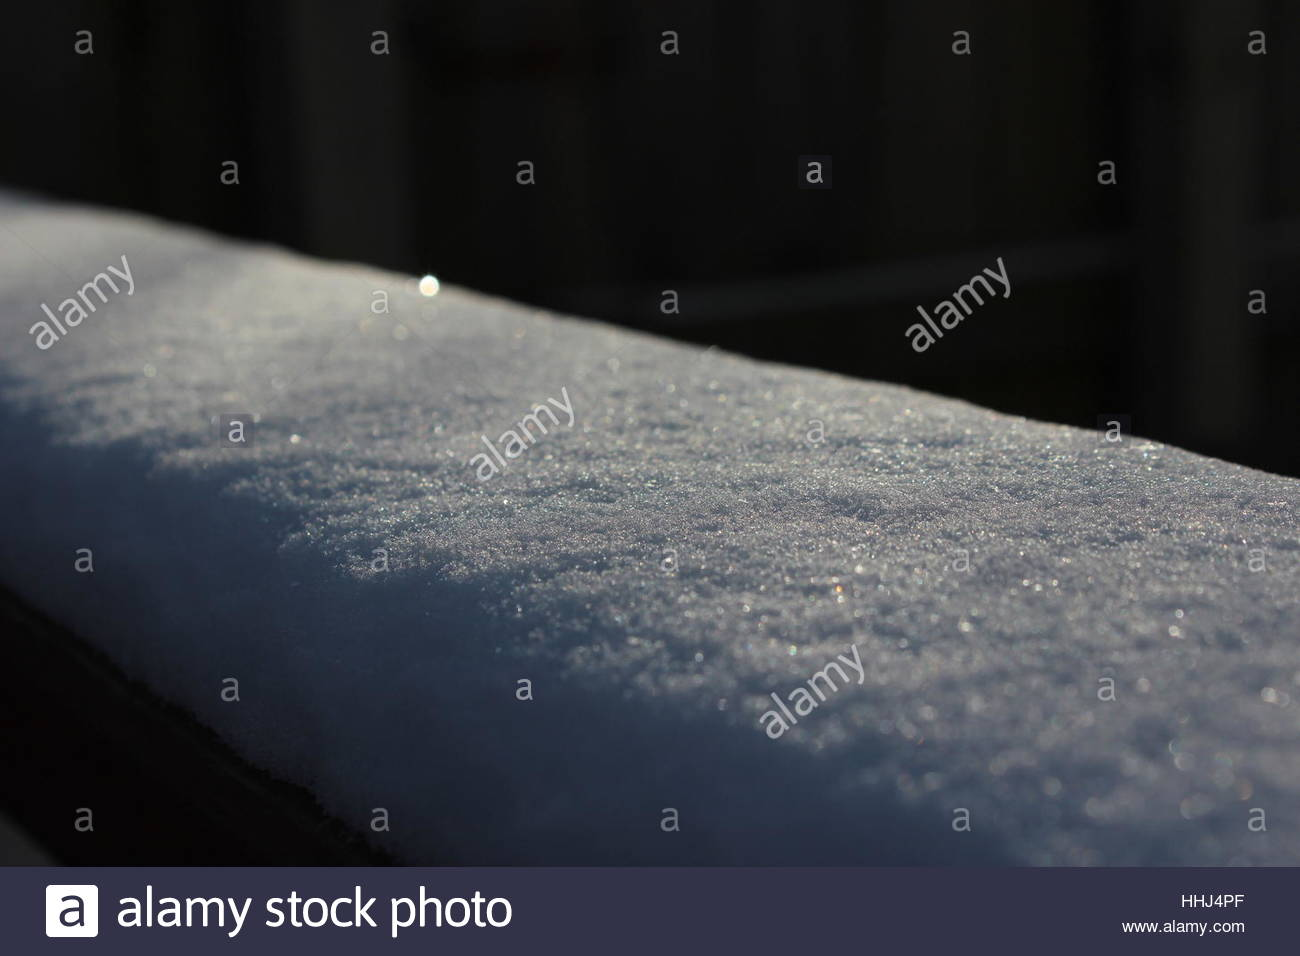 Blanket of snow glistening in Winter sunshine - Stock Image